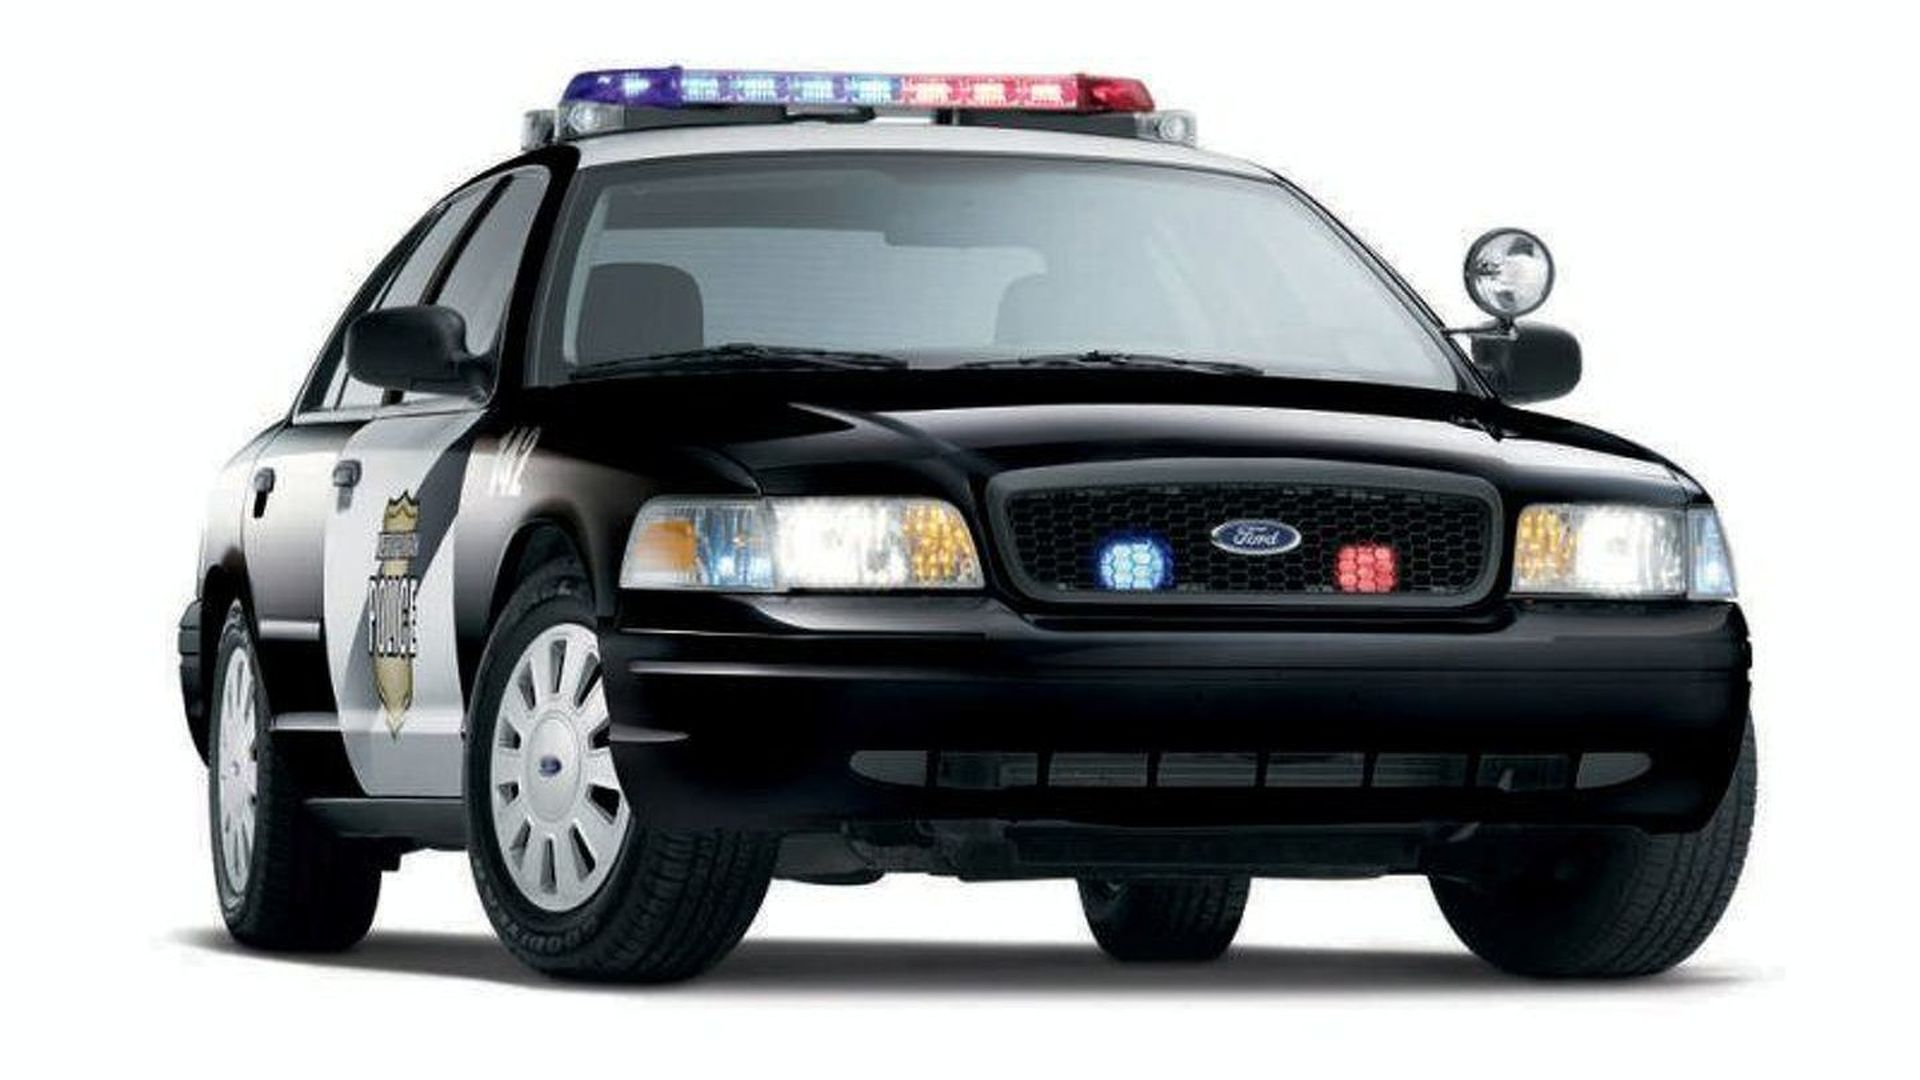 Nostalgia kick: Ford retires the Crown Victoria police car